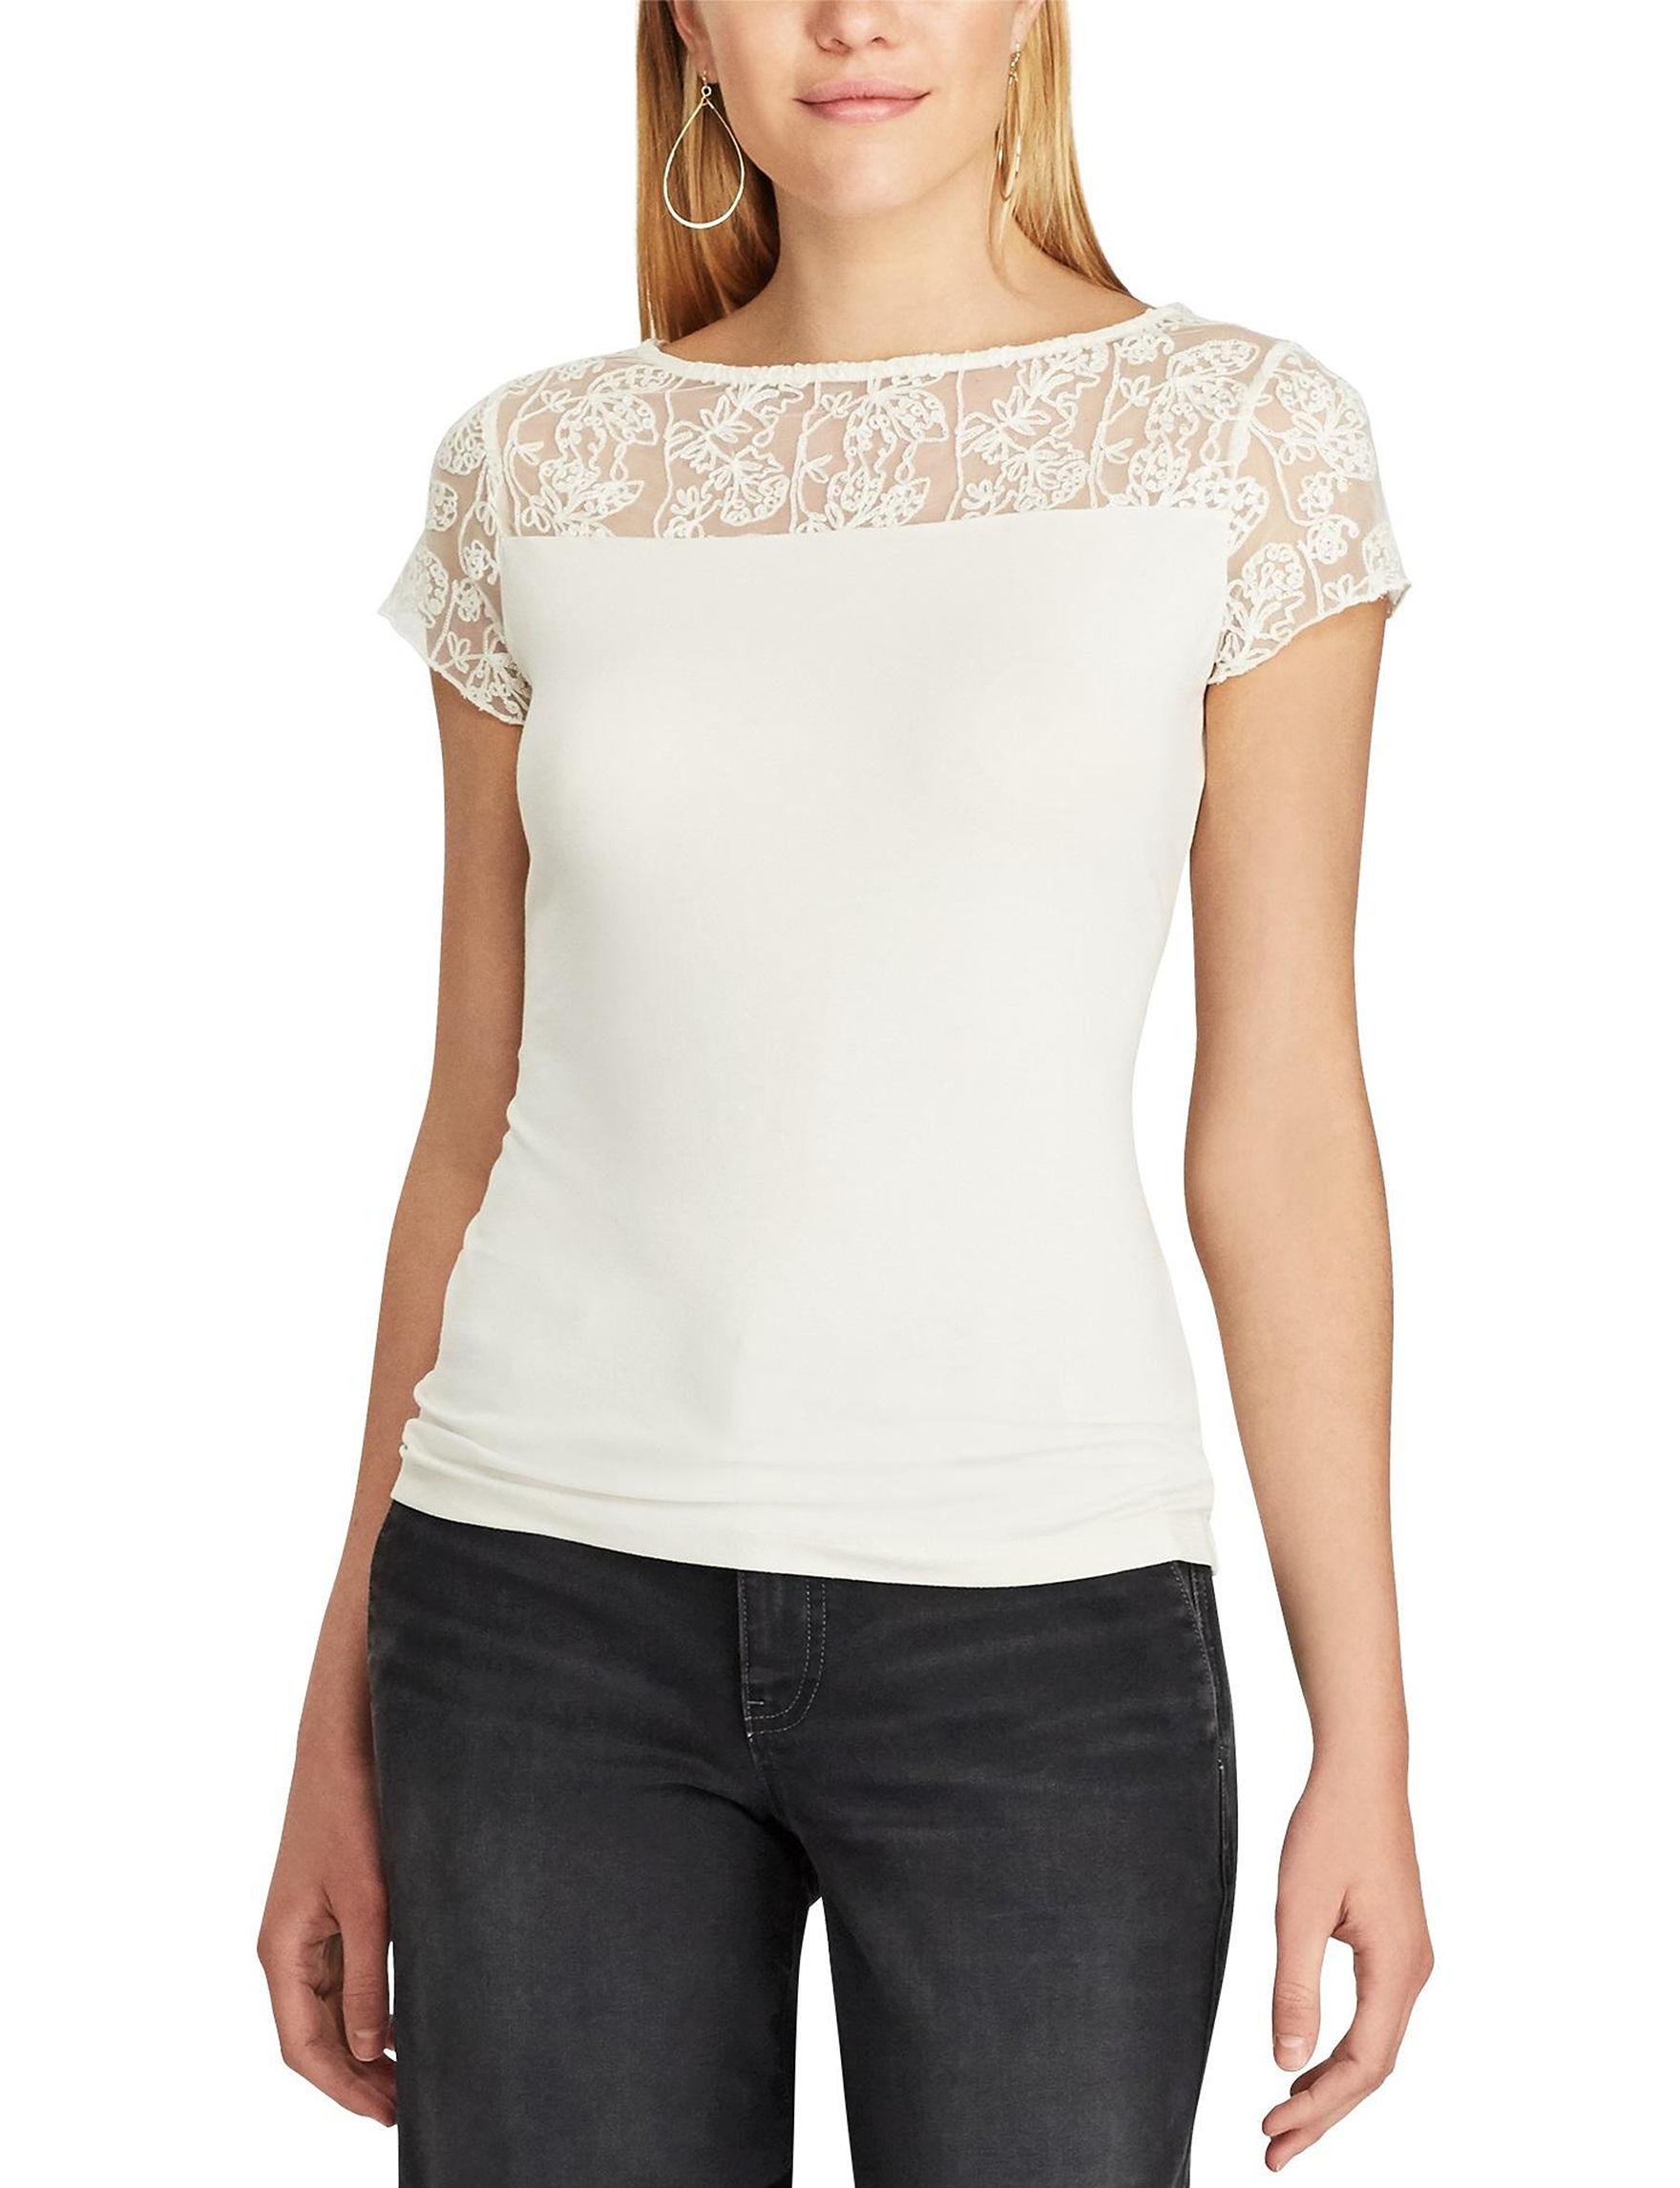 Chaps White Shirts & Blouses Tees & Tanks